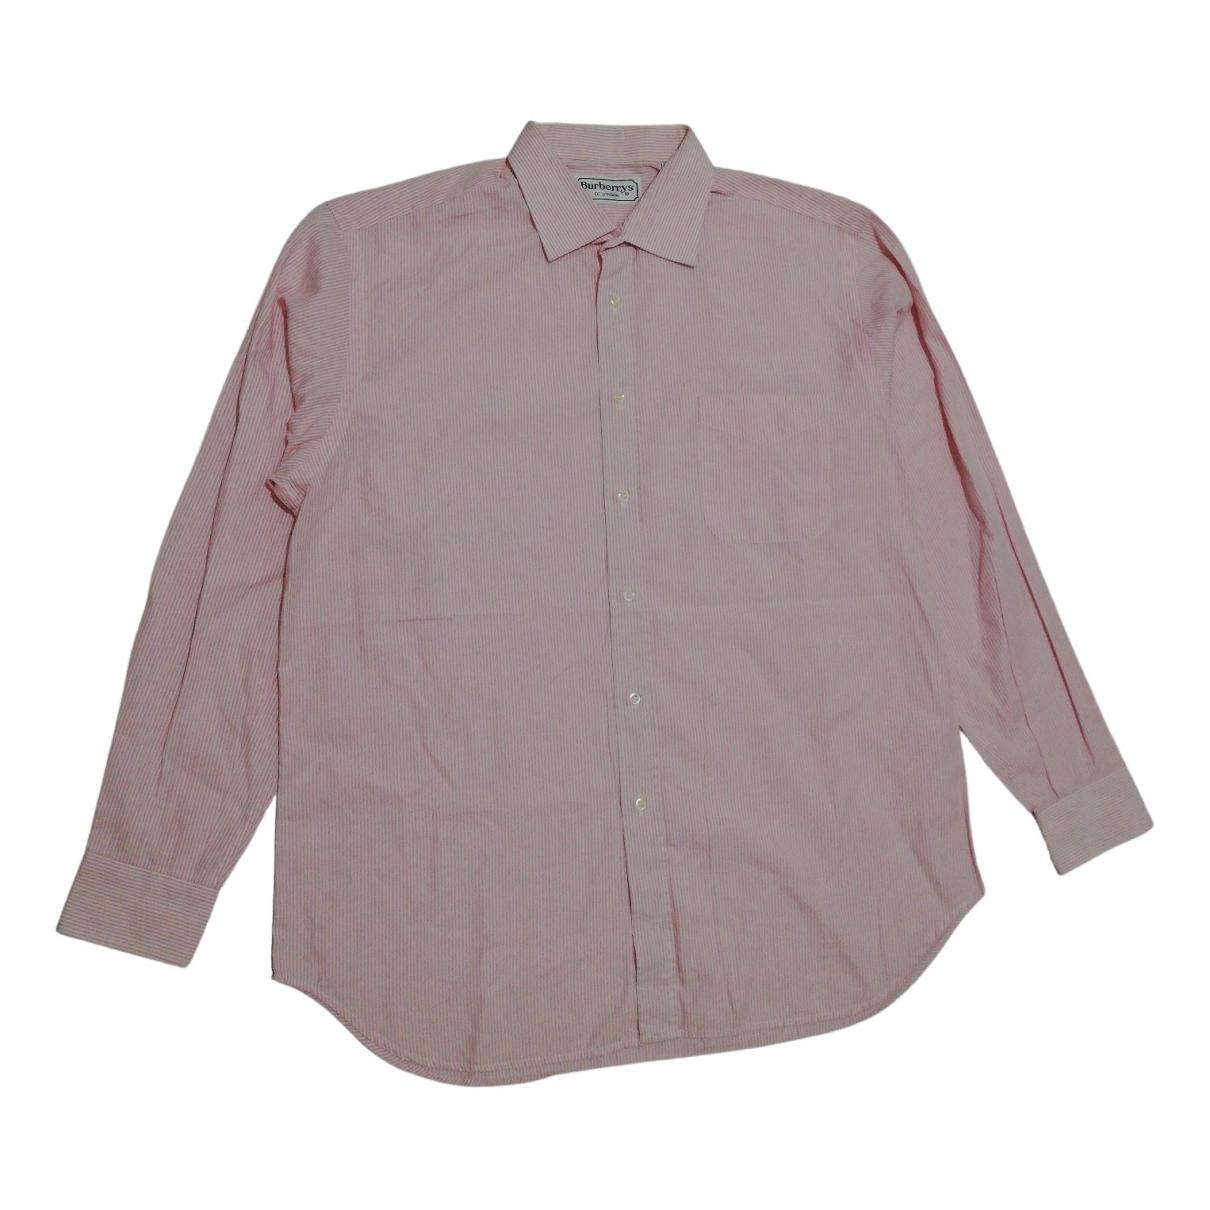 Burberry \N Multicolour Cotton Shirts for Men 42 EU (tour de cou / collar)